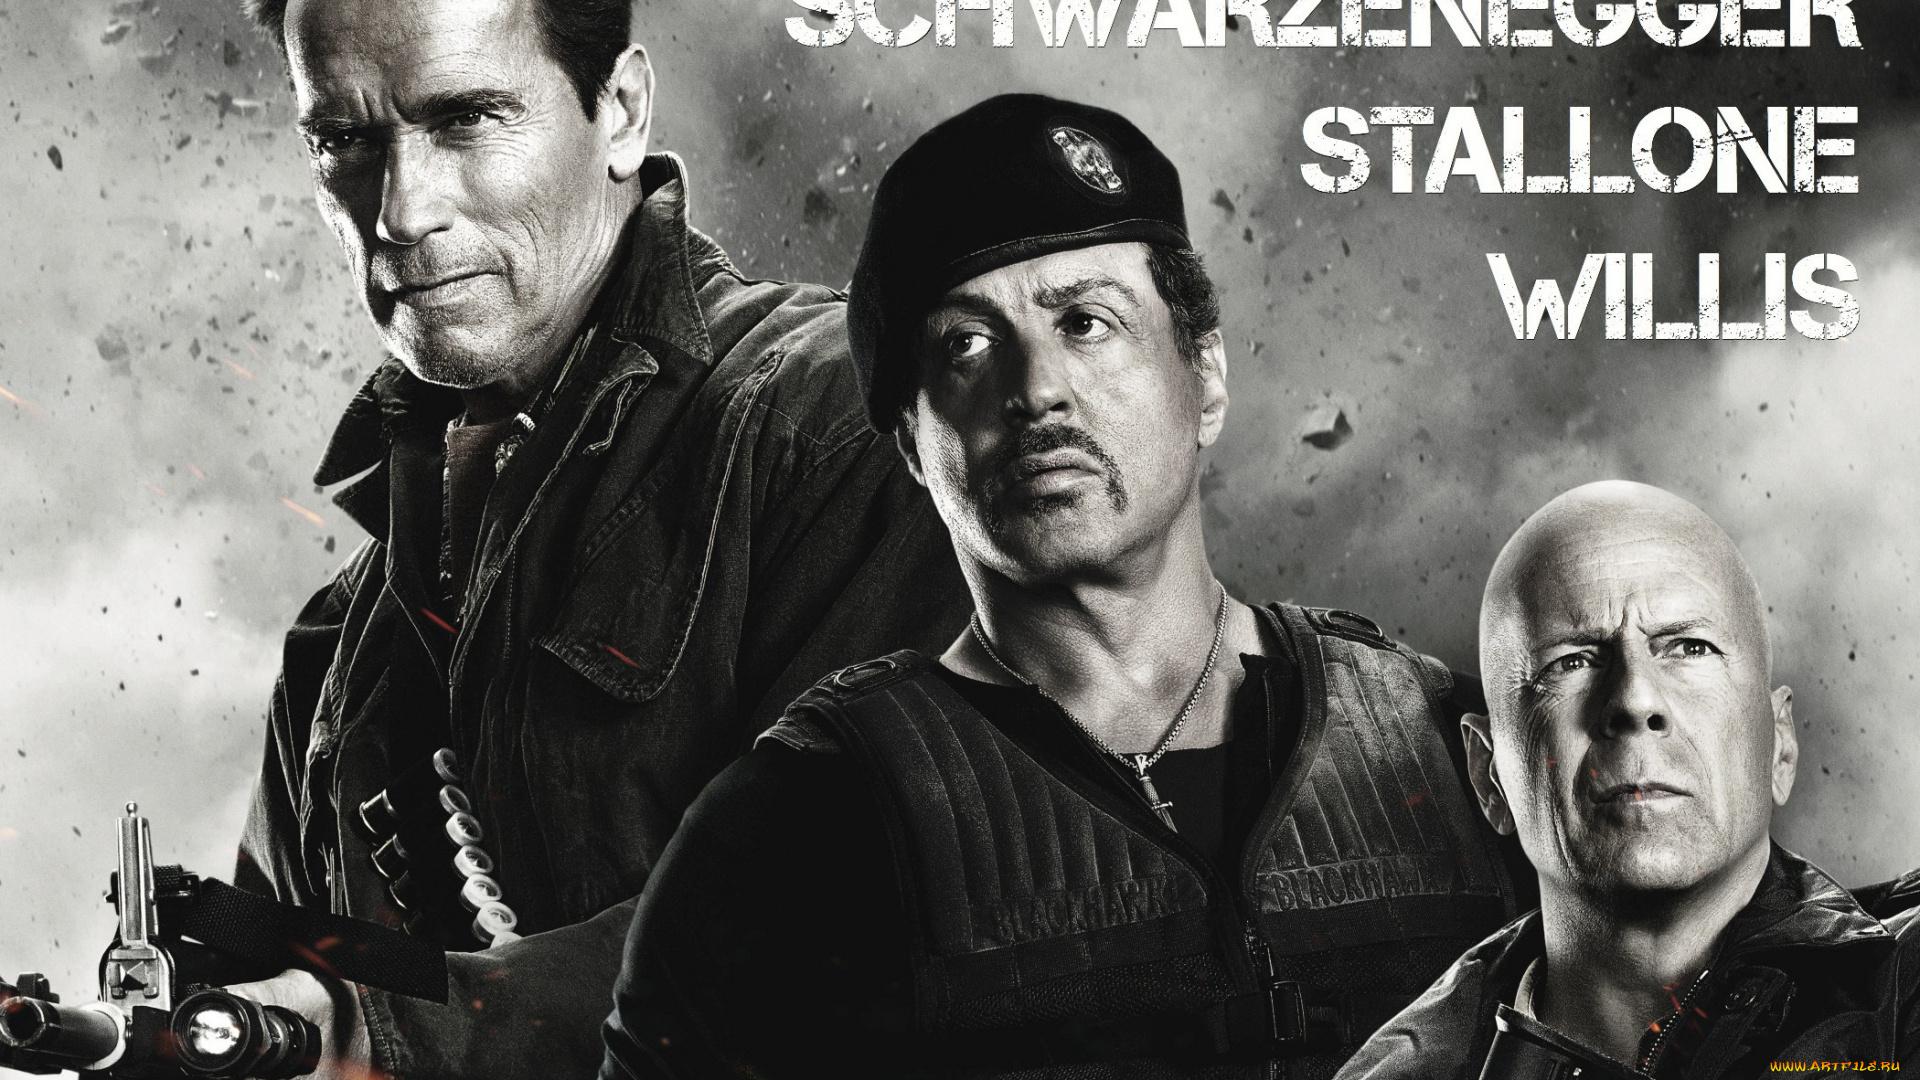 Bruce Willis, Expendables 2  № 1645369 без смс